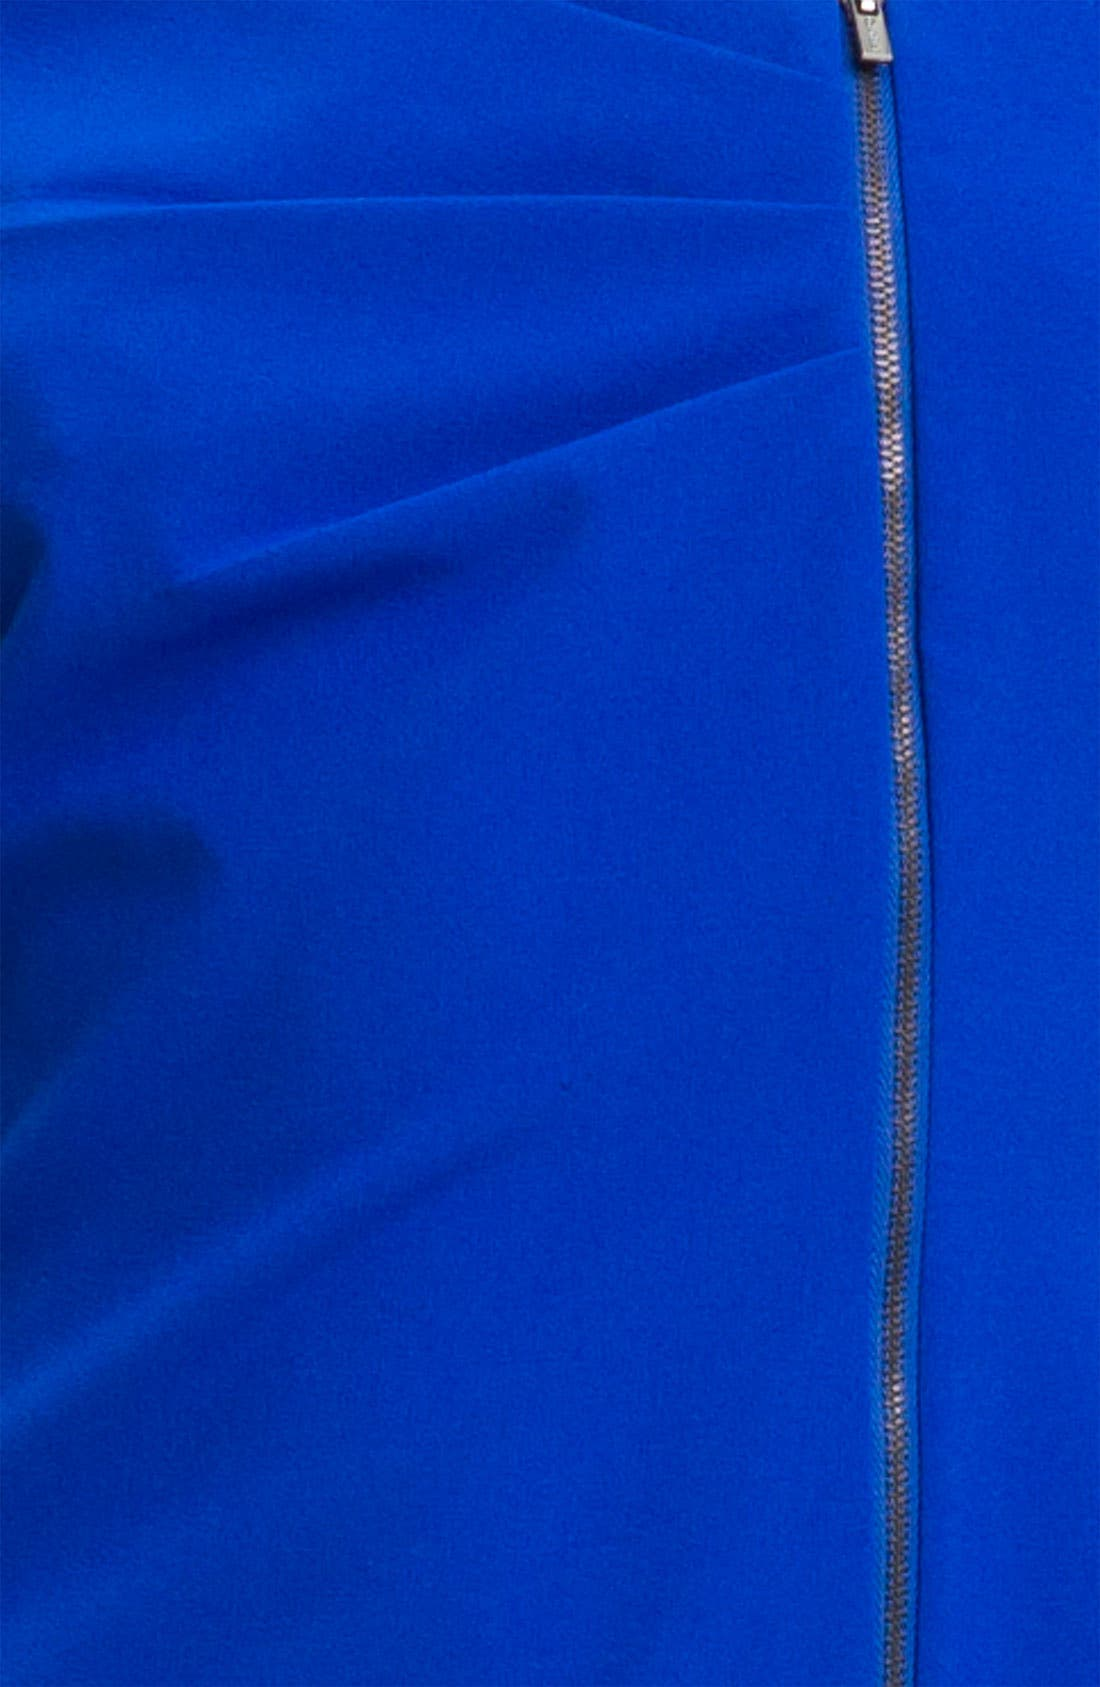 Jersey Shift Dress,                             Alternate thumbnail 2, color,                             471